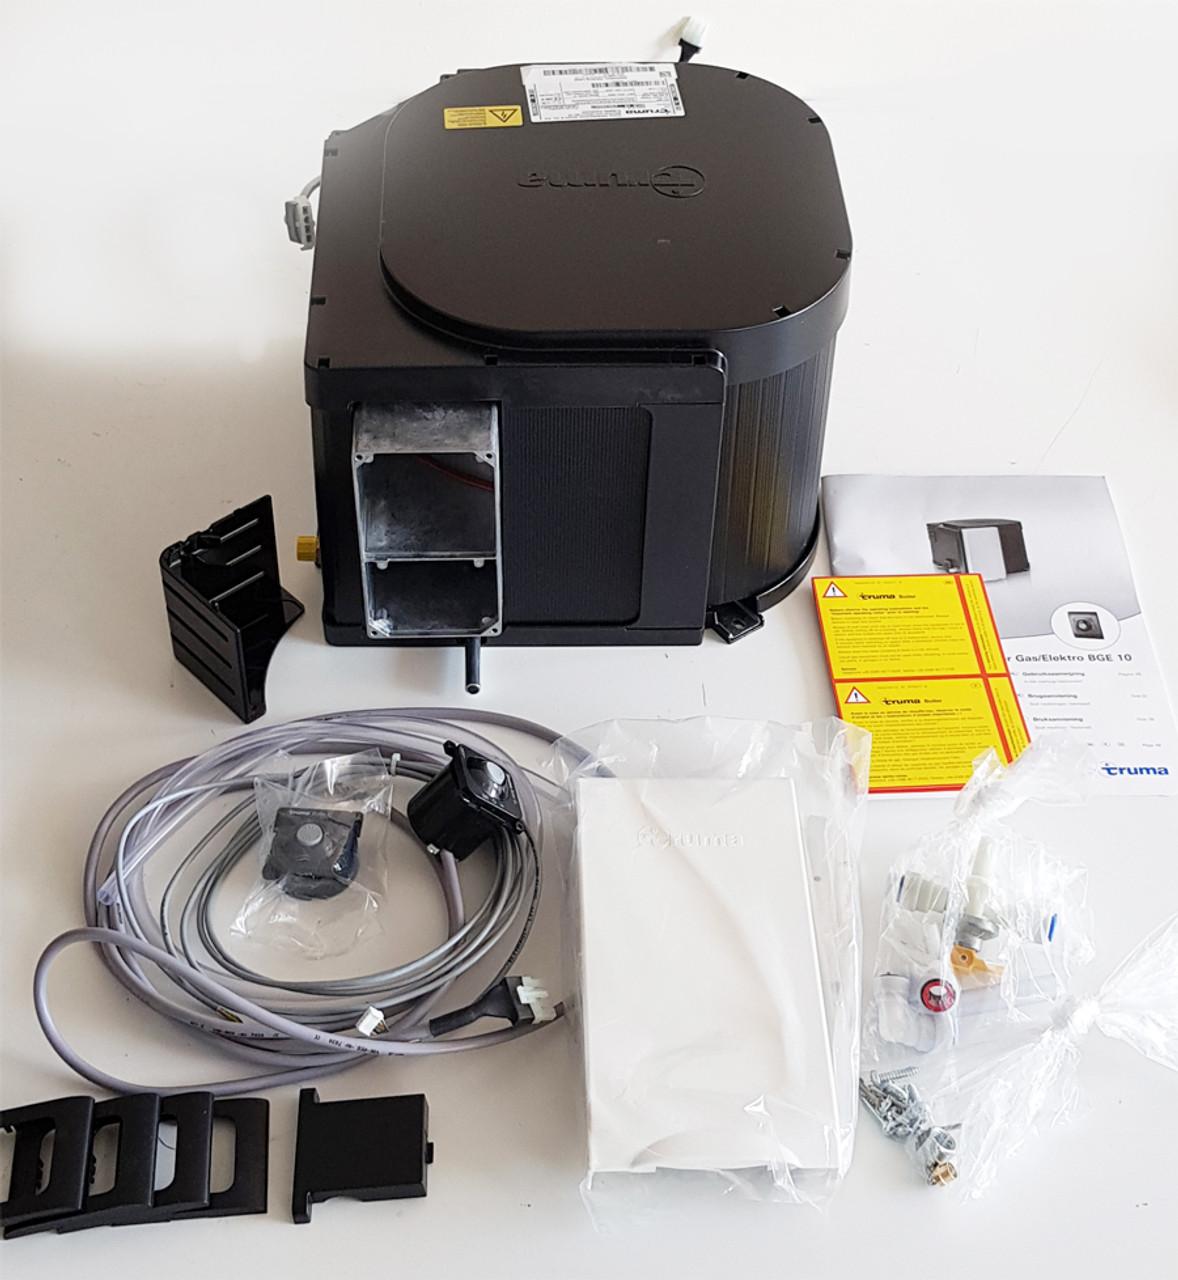 Truma Ultrastore caravan water heater what's in the box